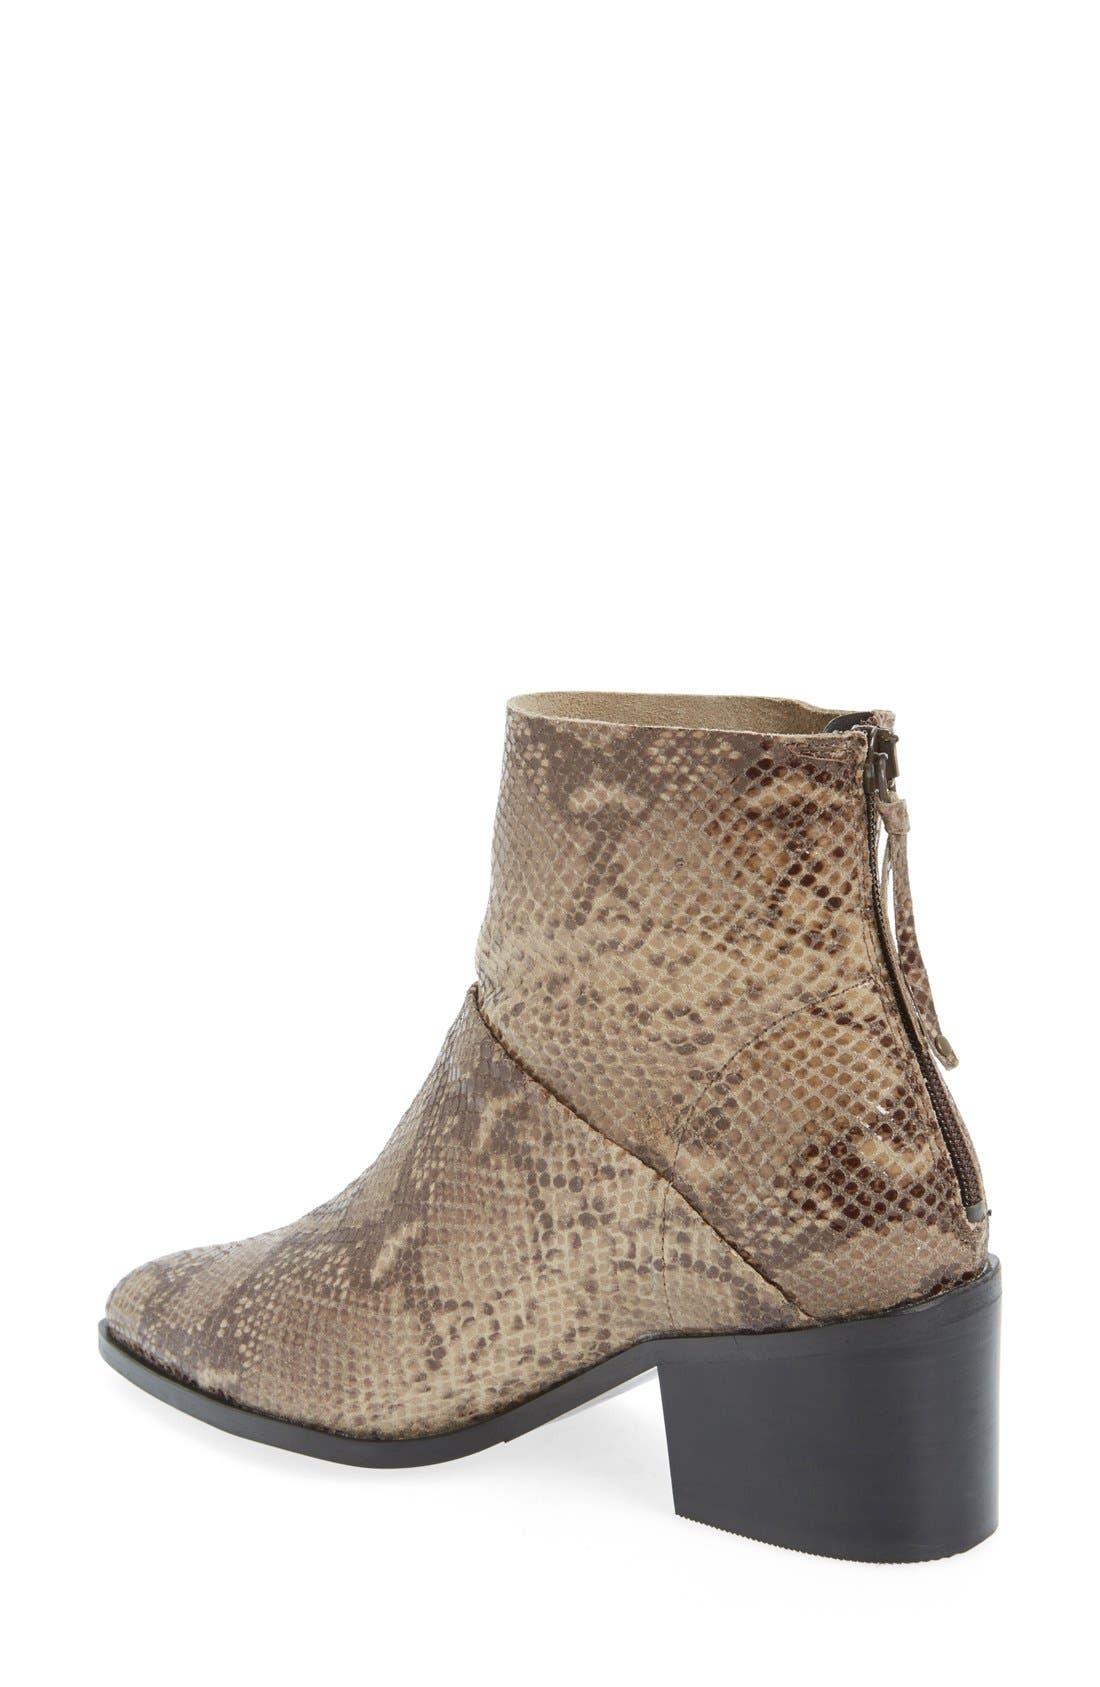 Alternate Image 2  - Topshop'Midnight' Snake Embossed Ankle Boot (Women)